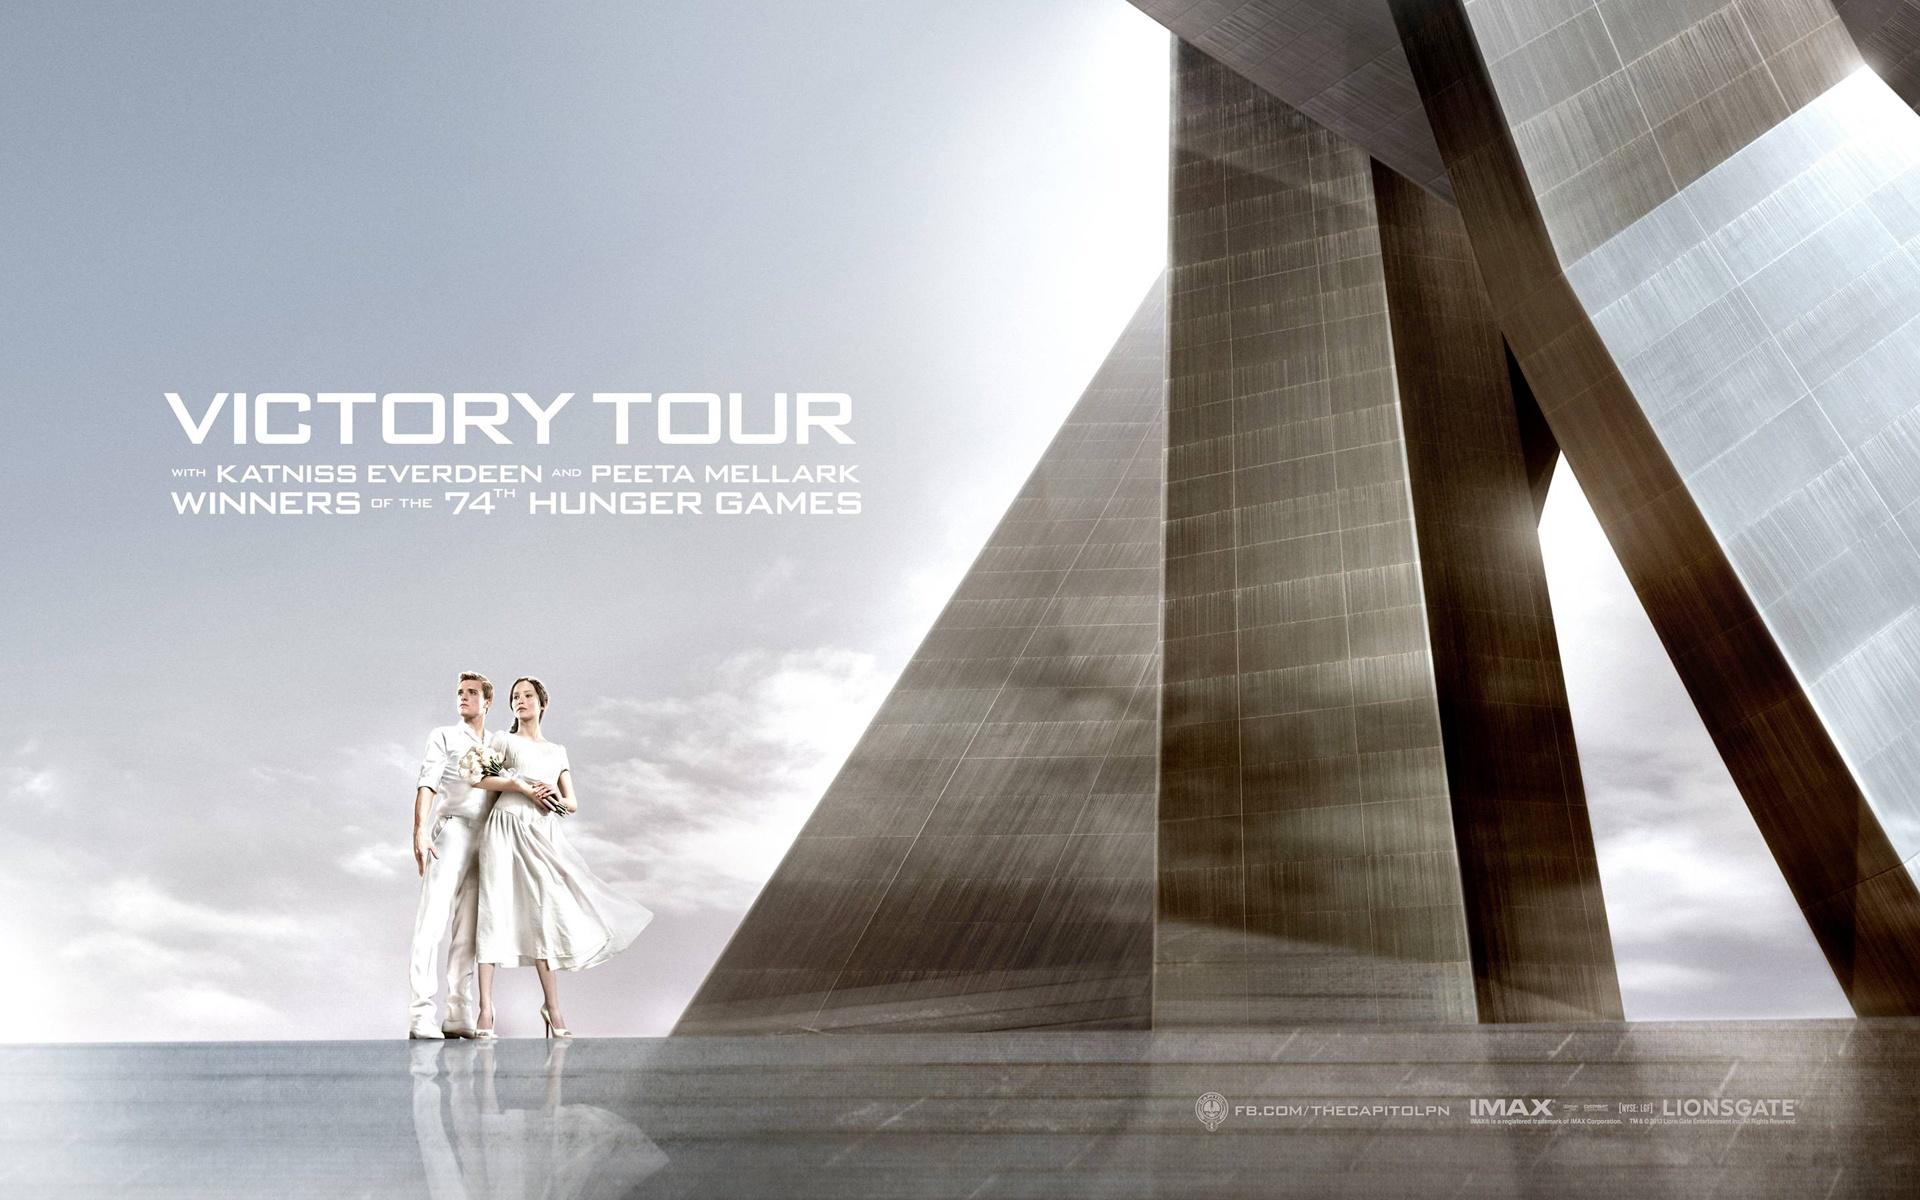 The Hunger Games Wallpaper 20